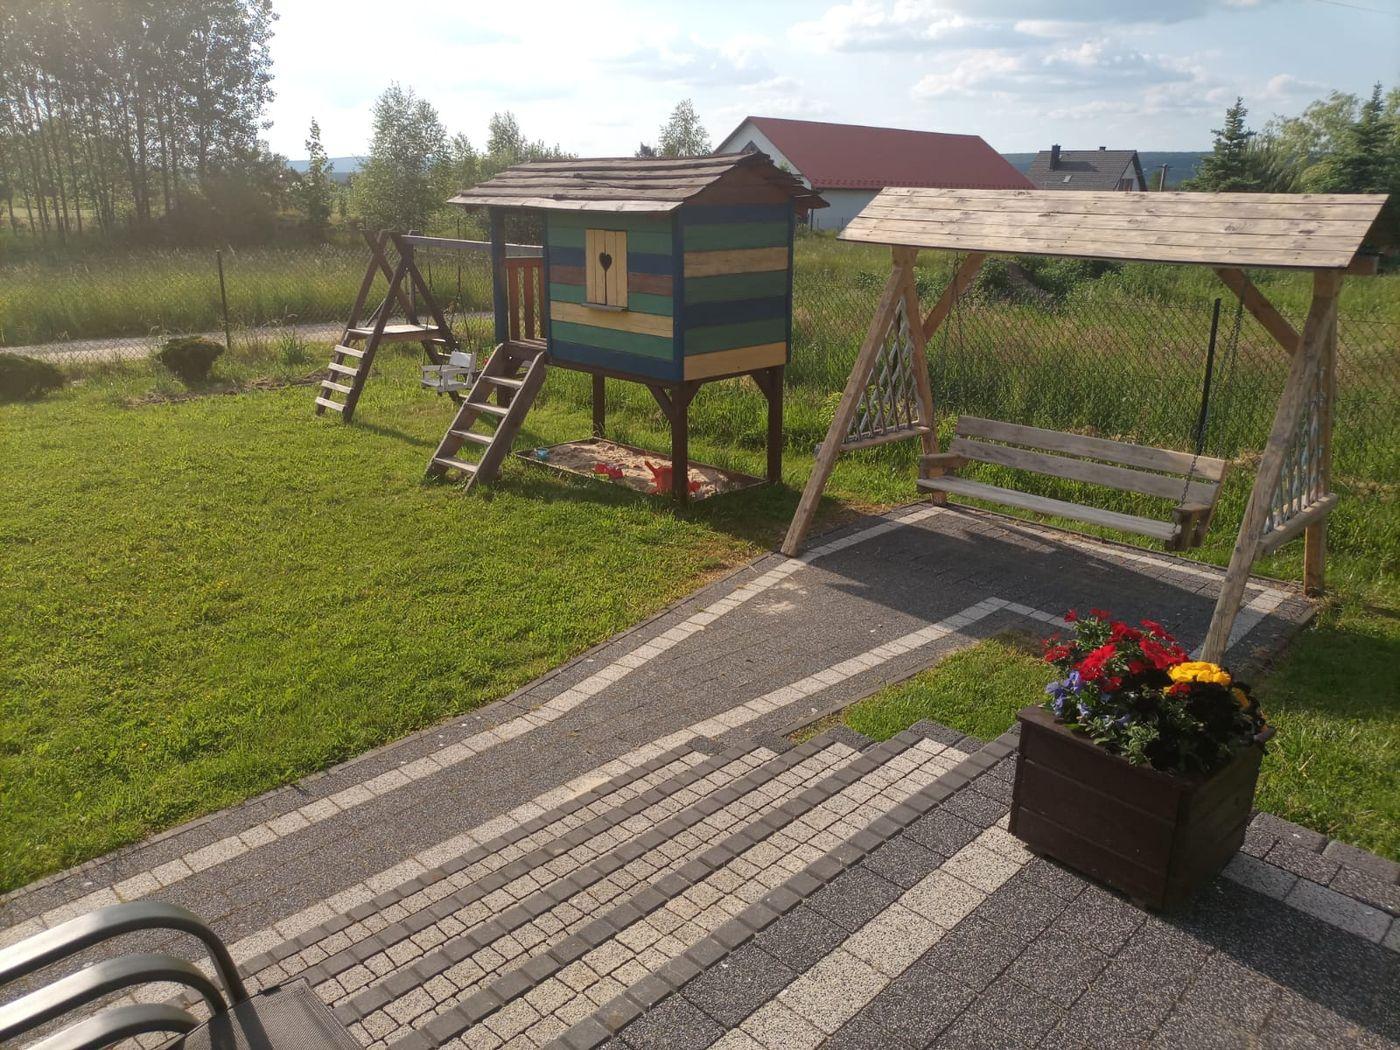 jagodowy-domek-lato_4